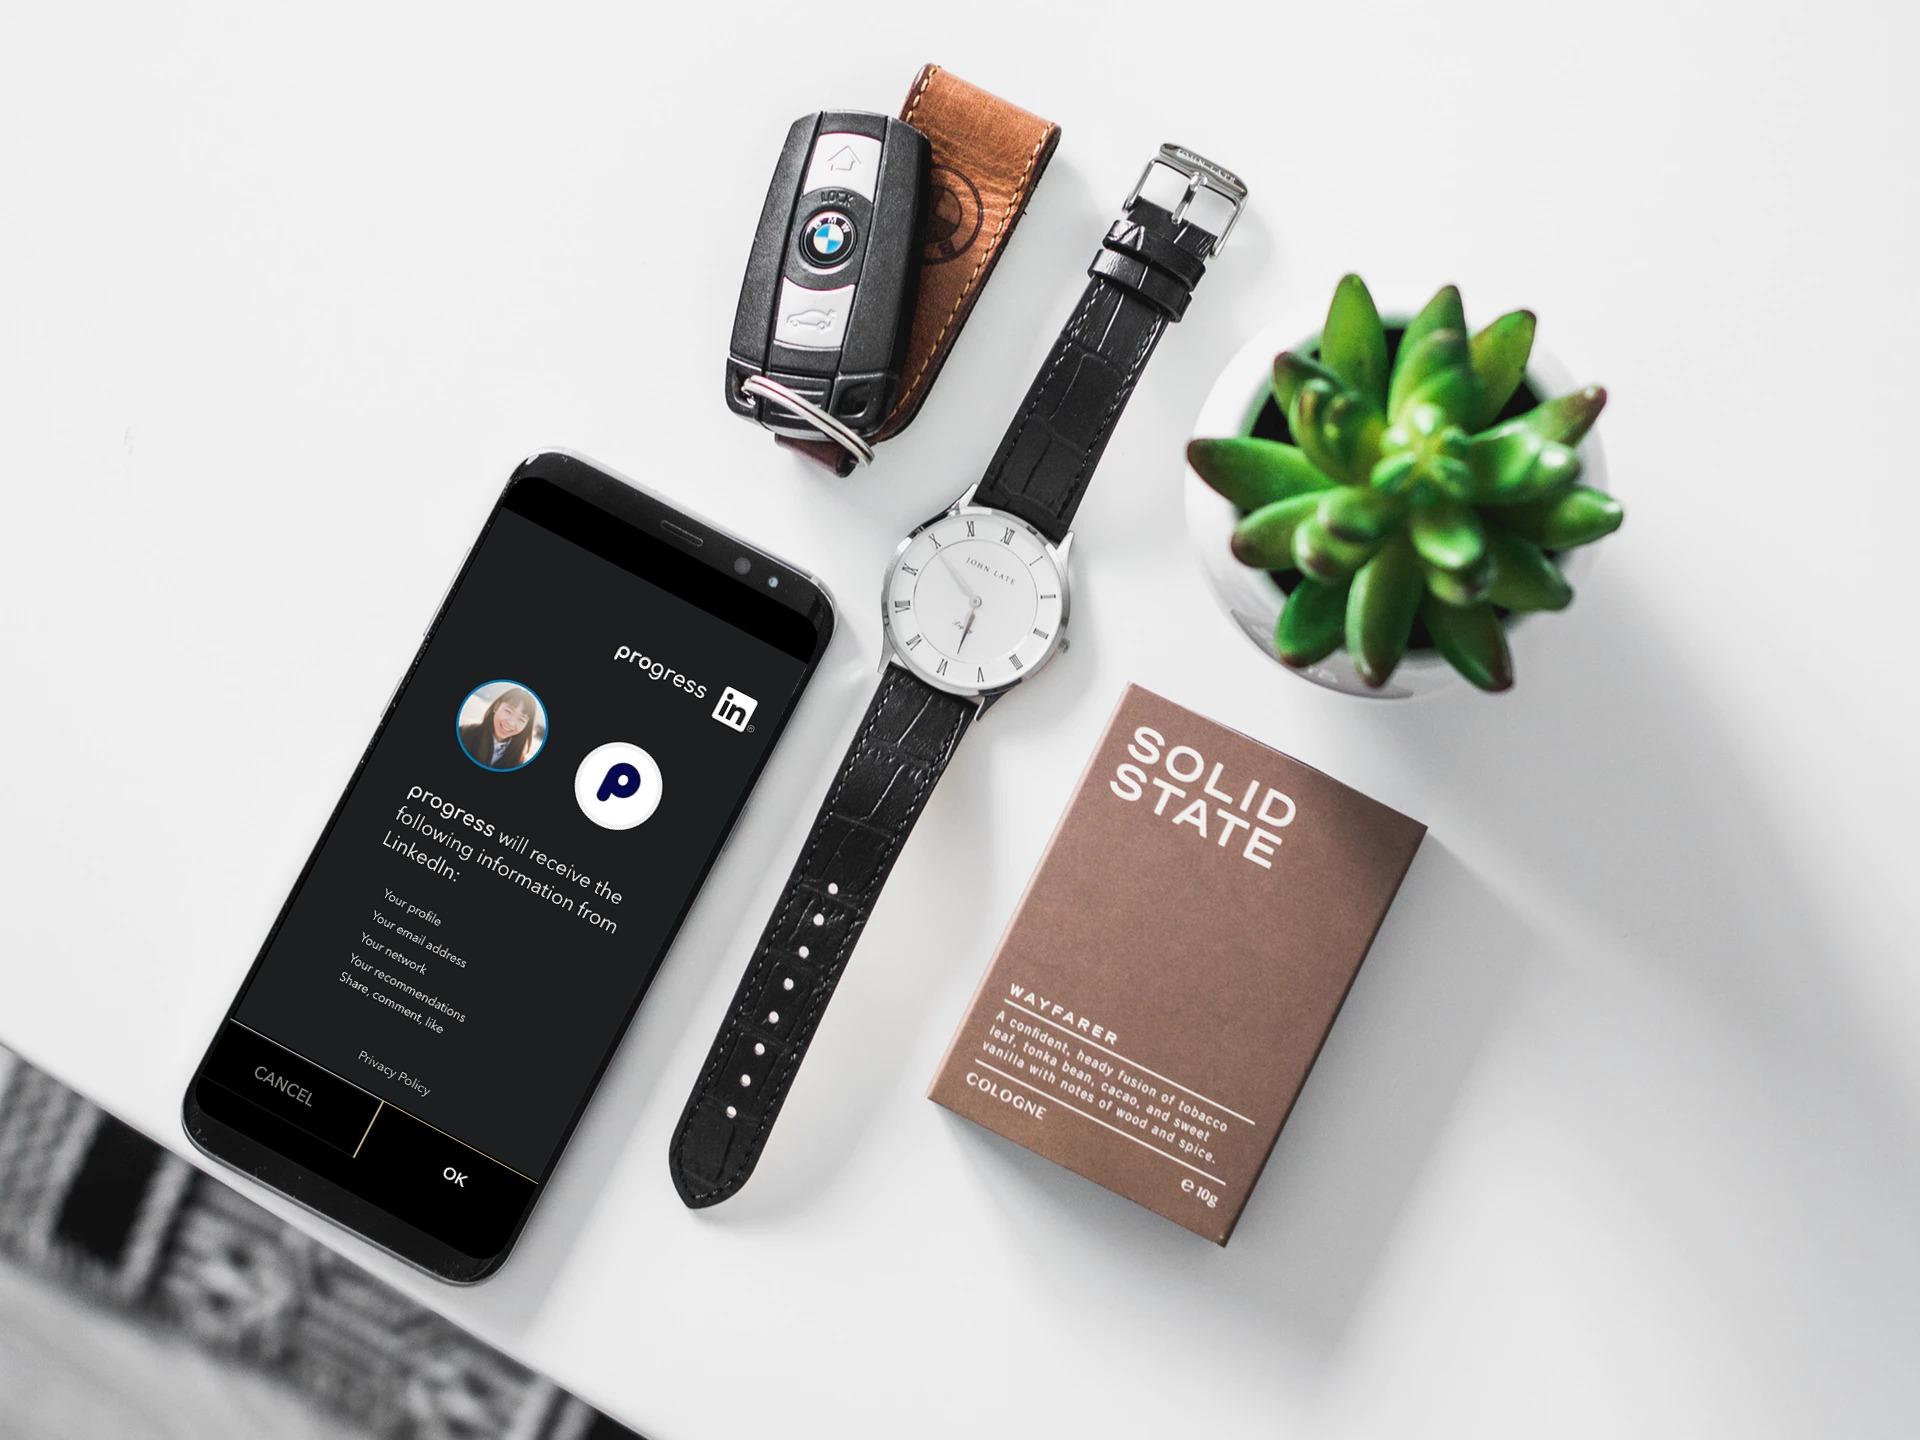 Progress mobile app (Material Design)